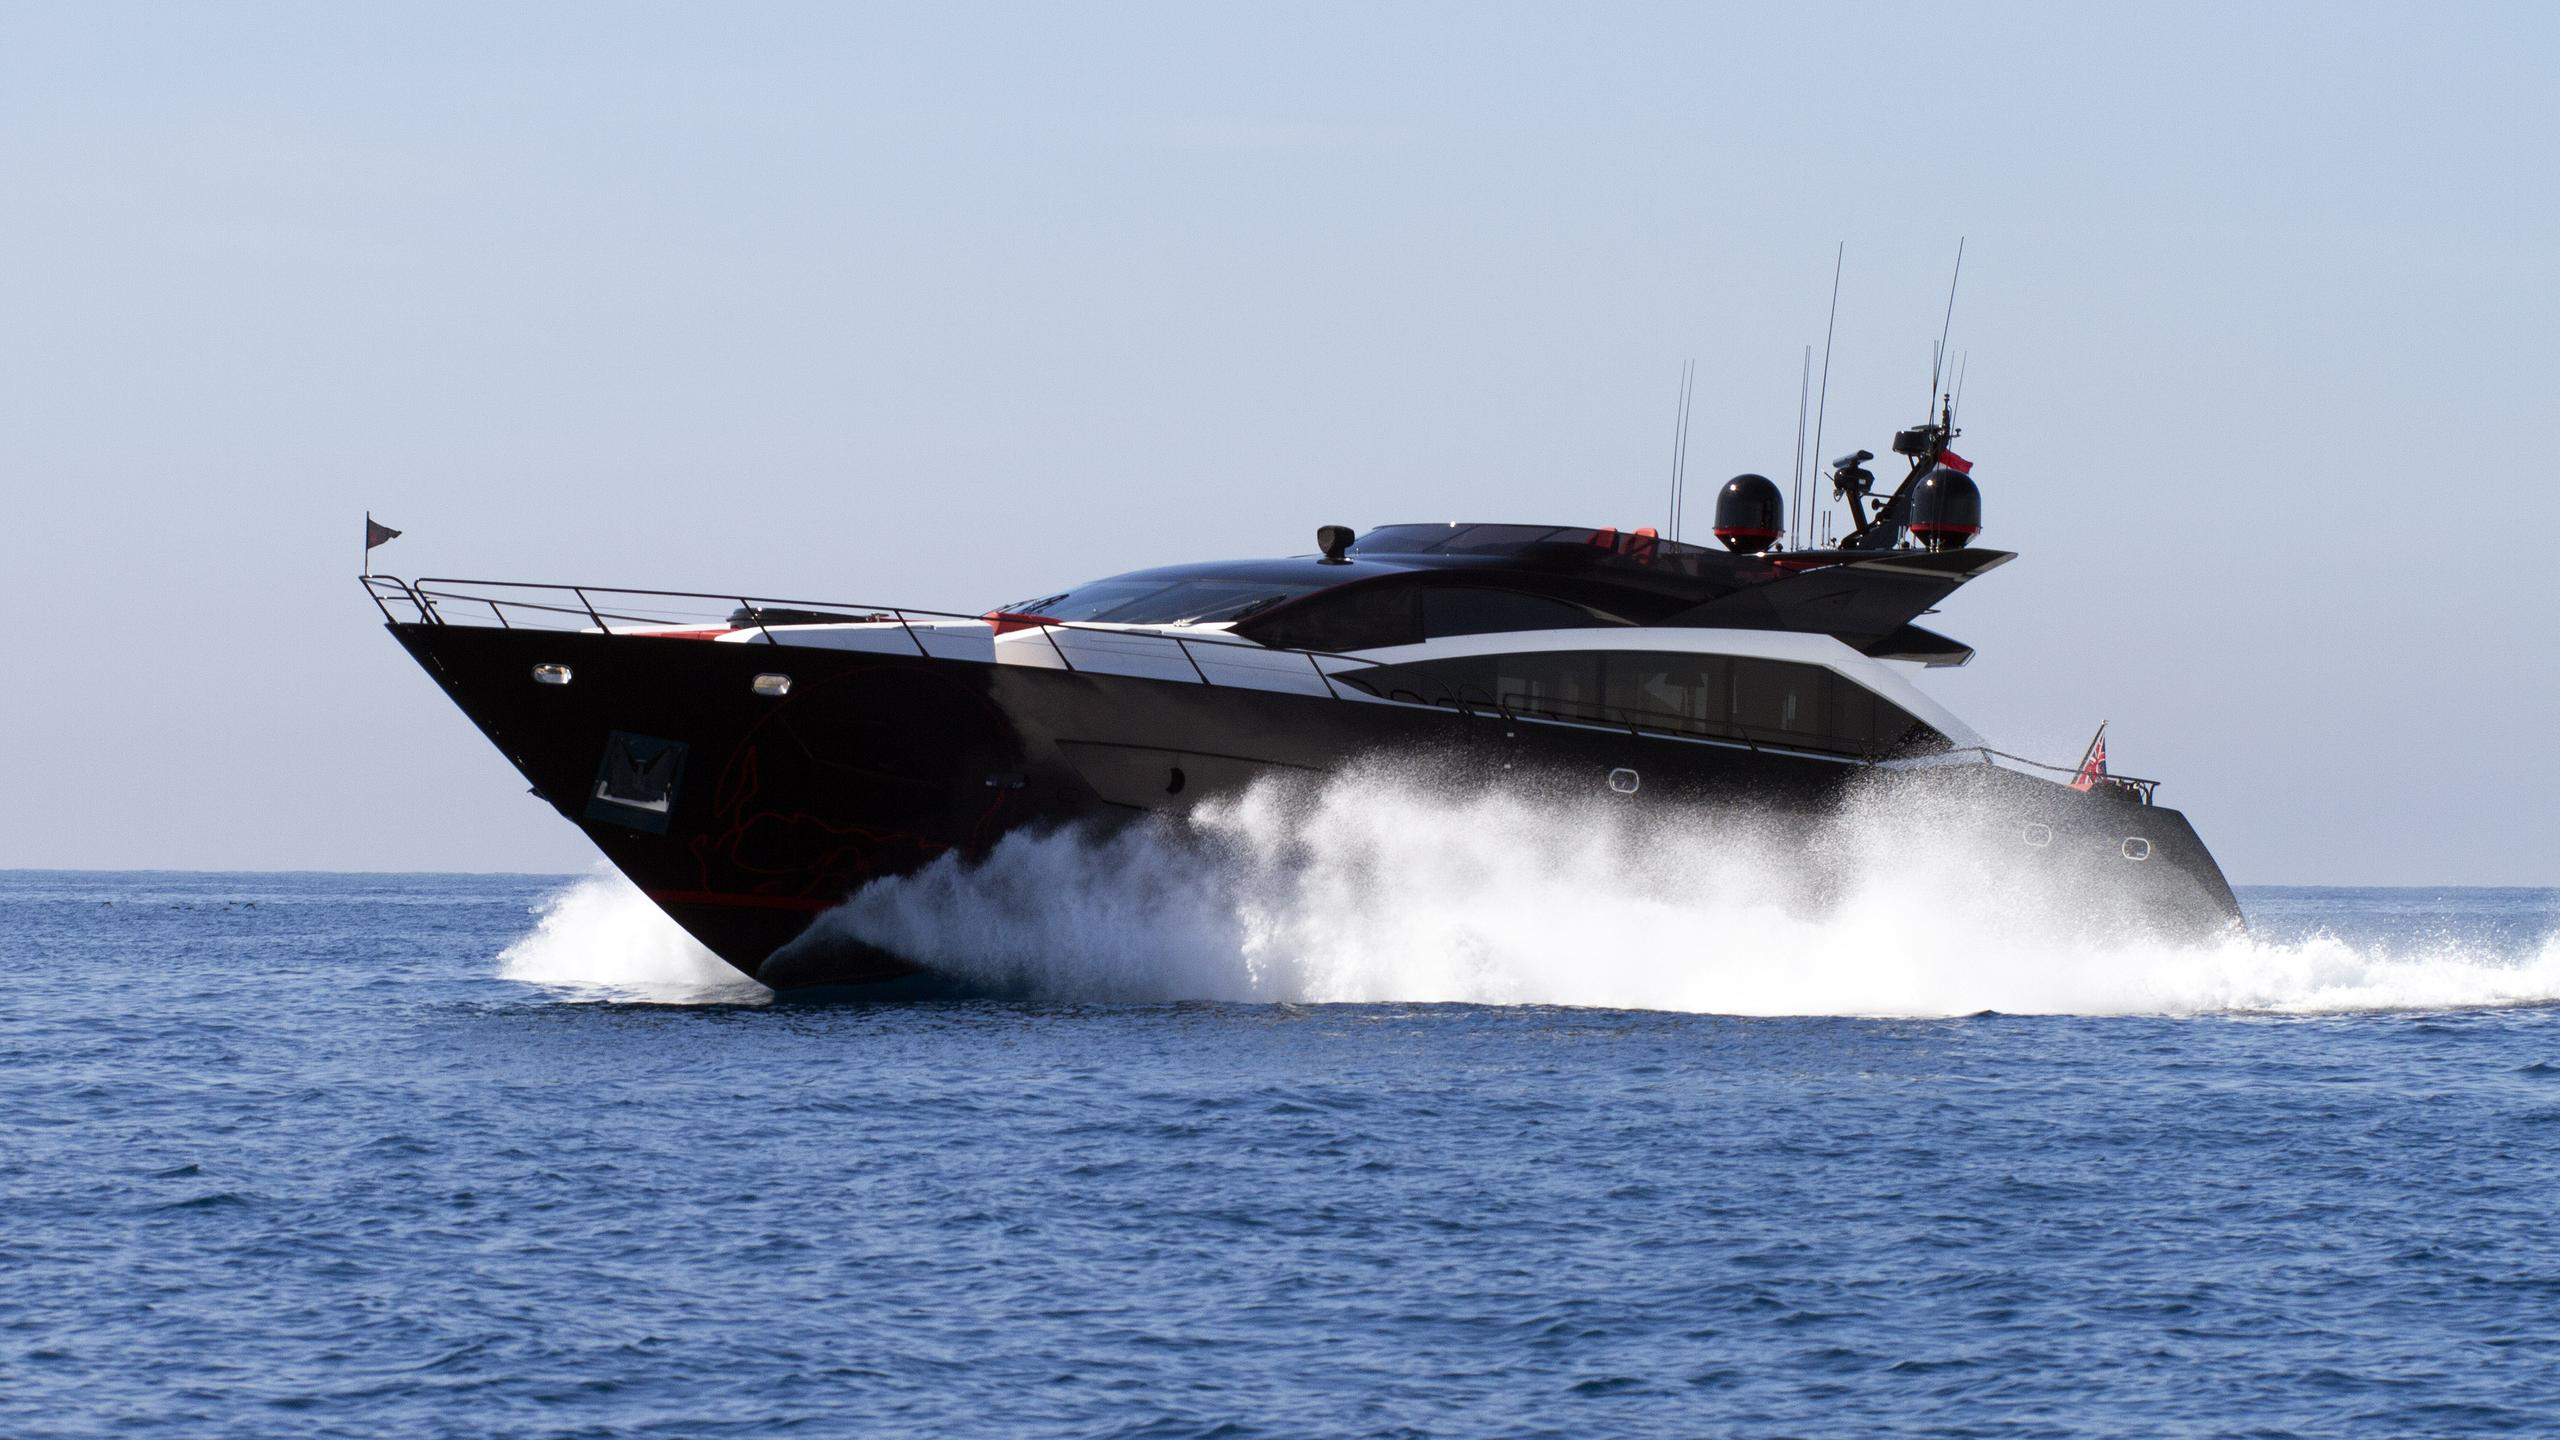 black-legend-motor-yacht-sunseeker-101-sy-2013-30m-running-half-profile